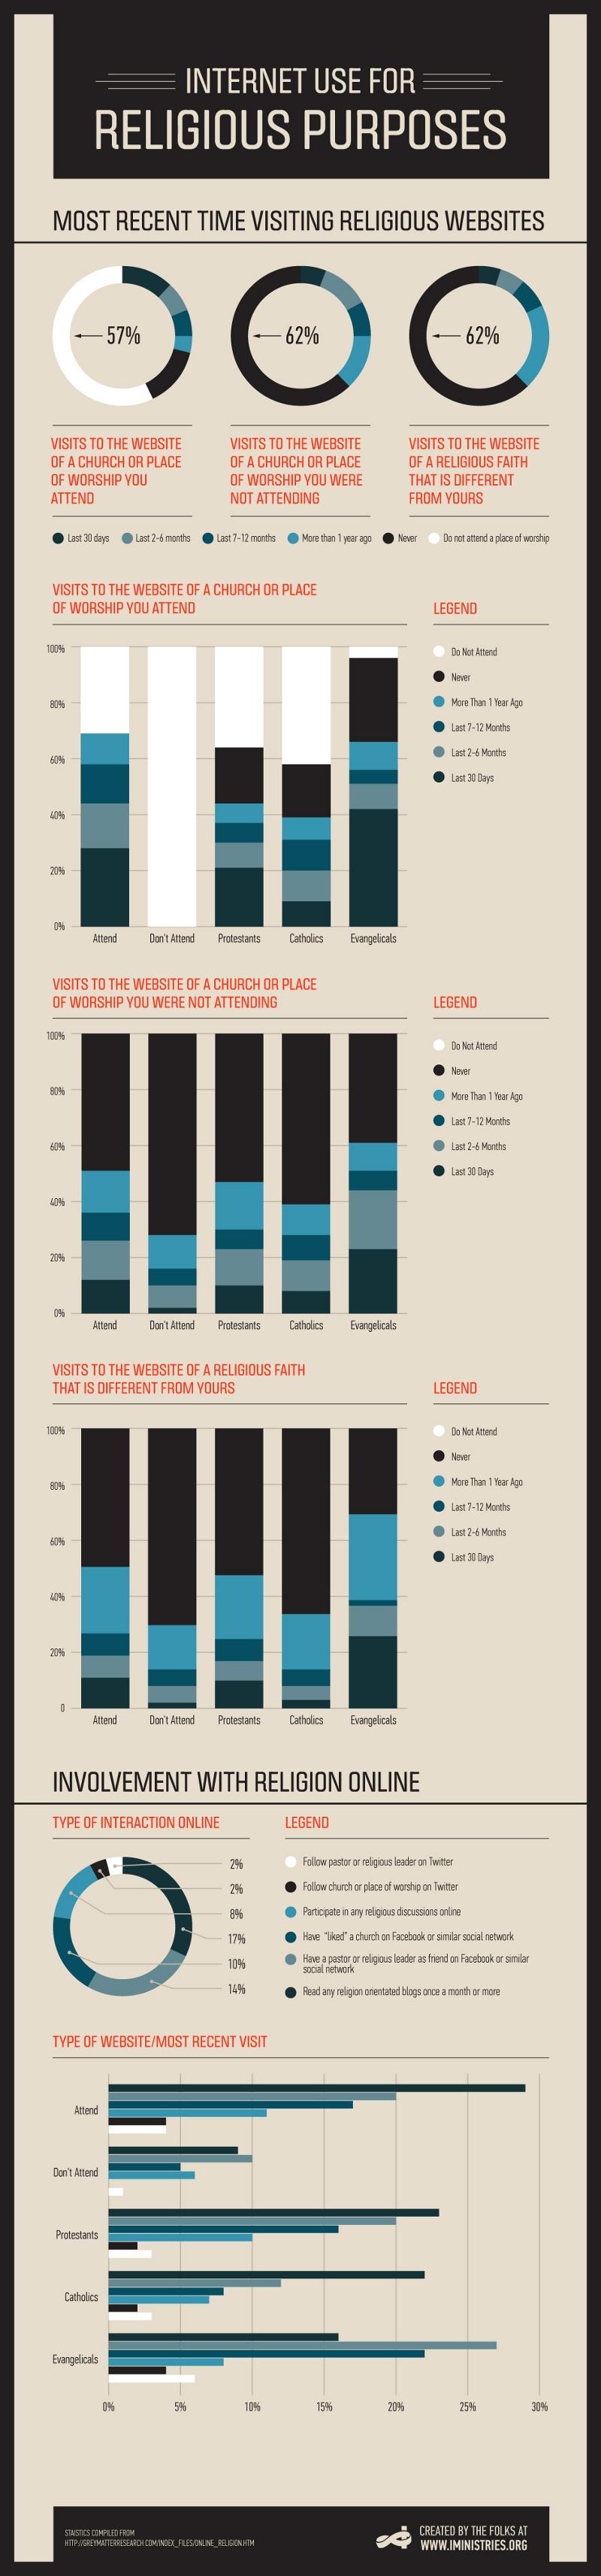 Religious Internet Usage Statistics